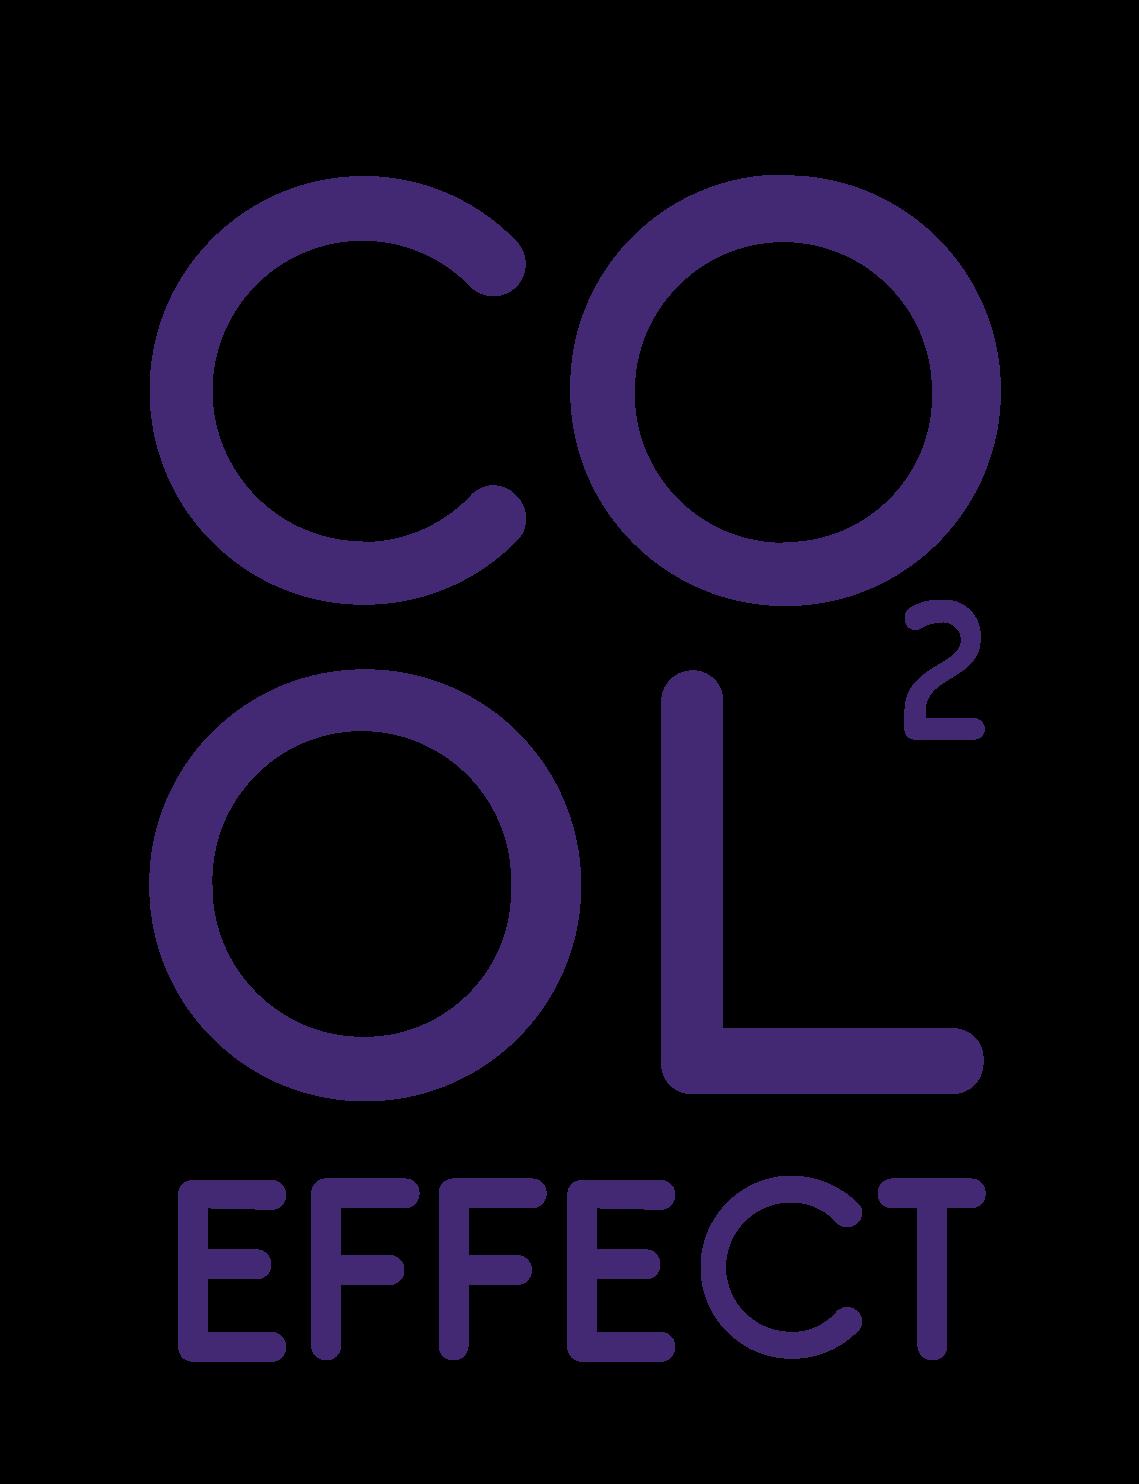 Cool Effect logo